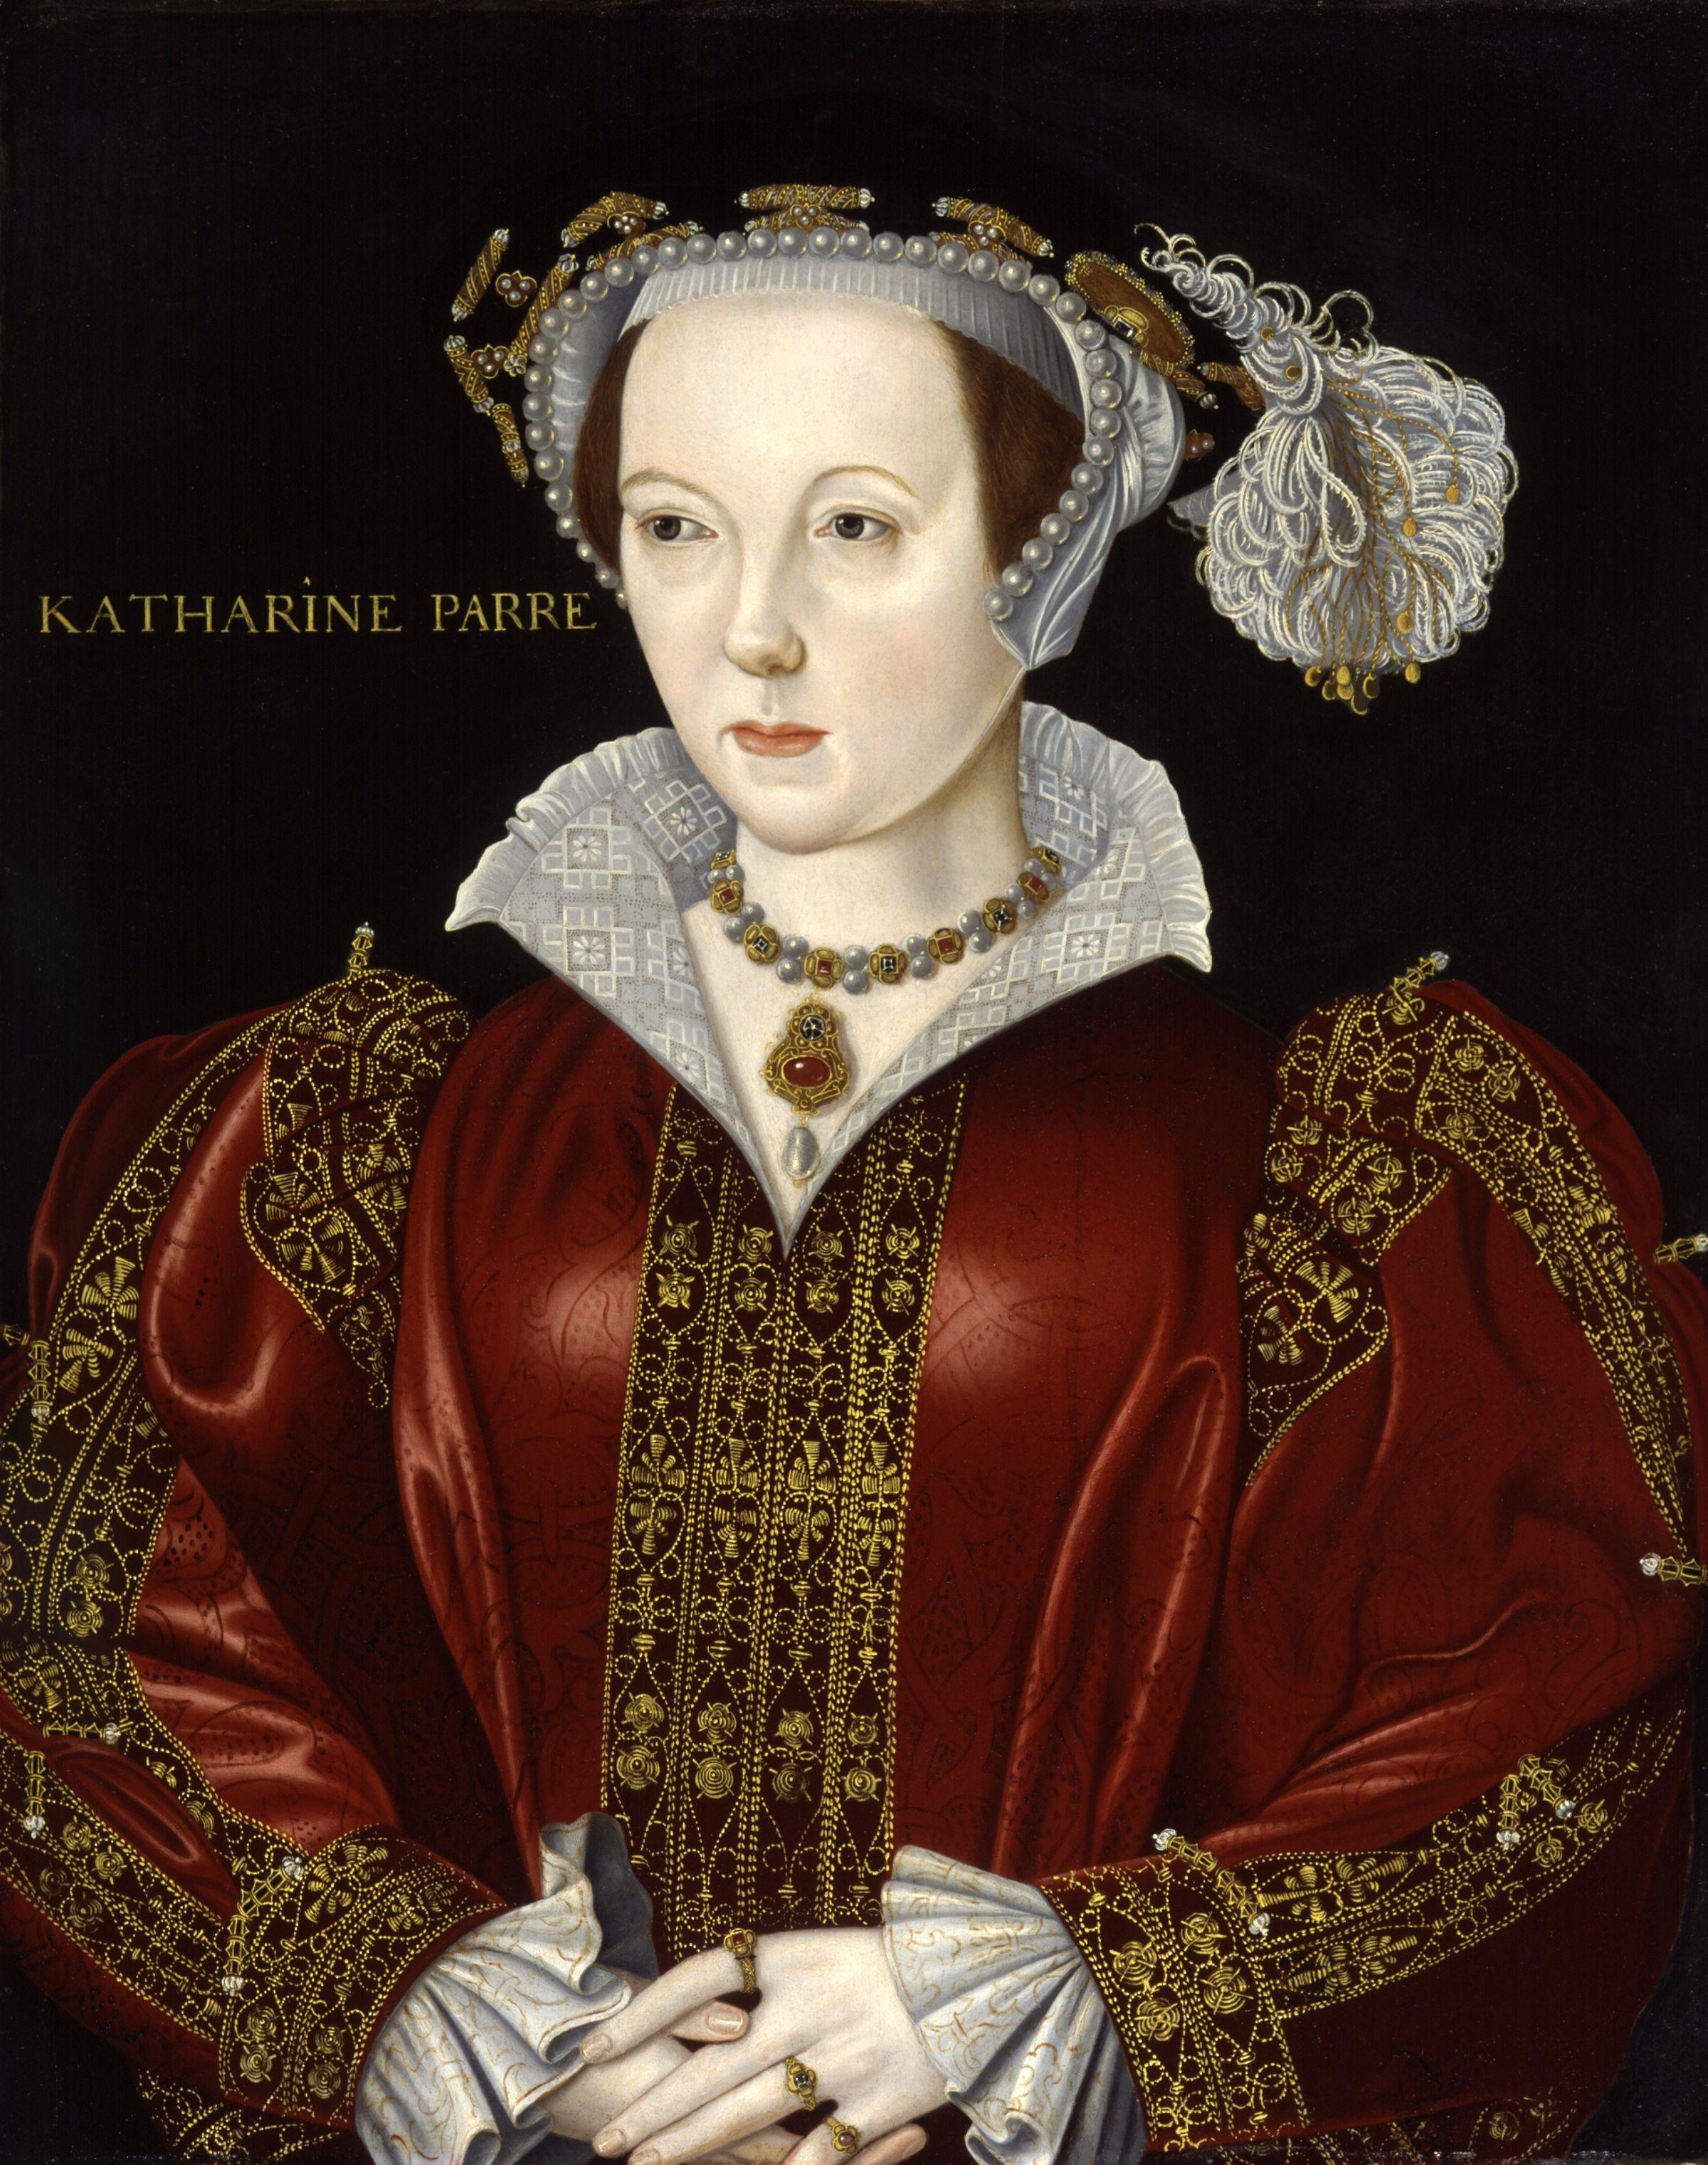 Katheryn Parr